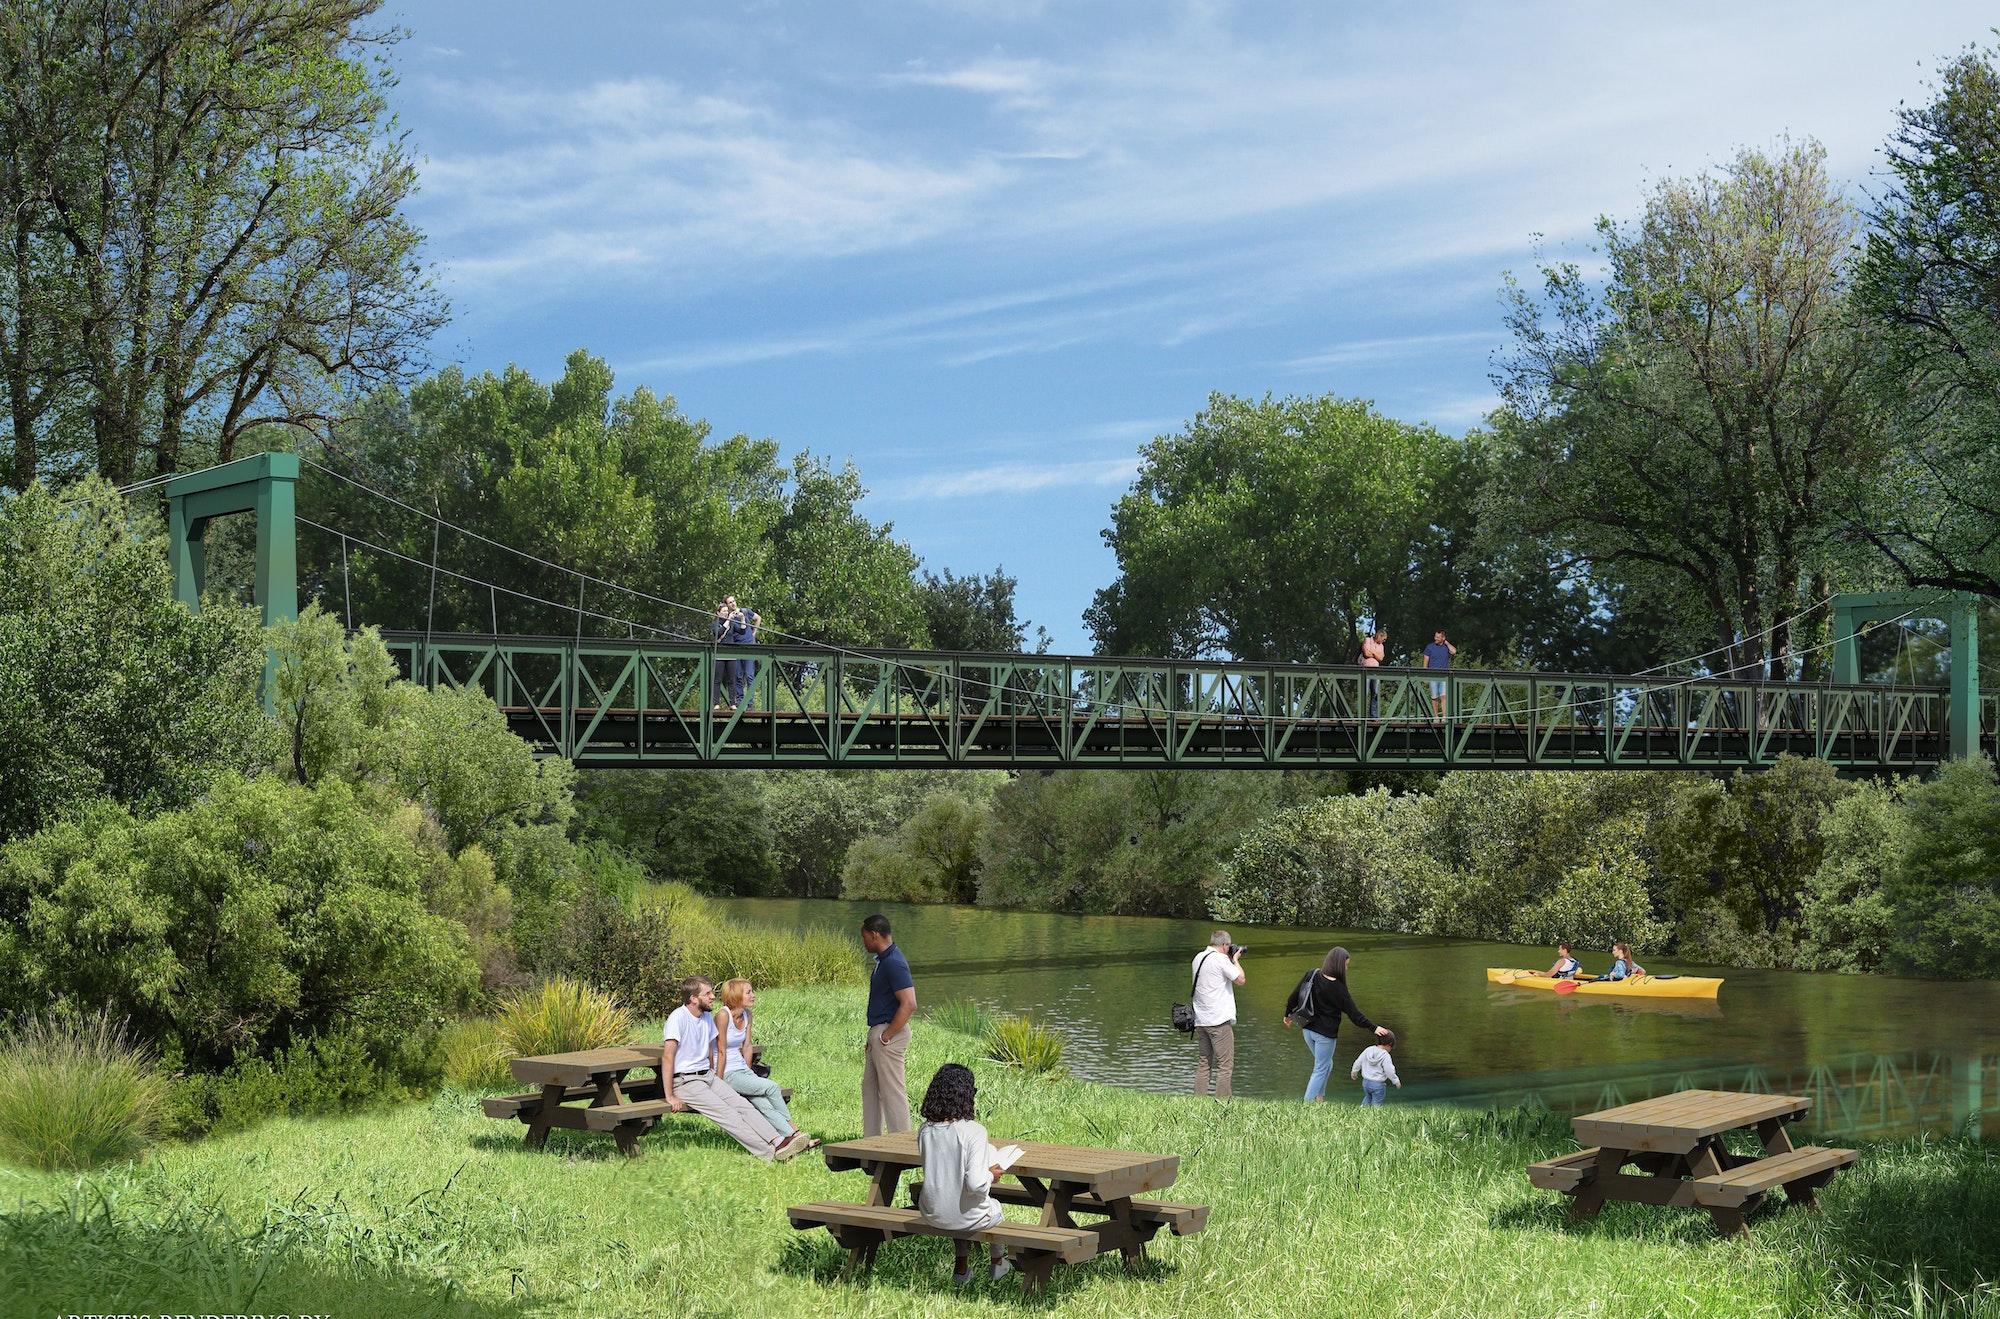 CAWD Carmel River Bridge Rendering